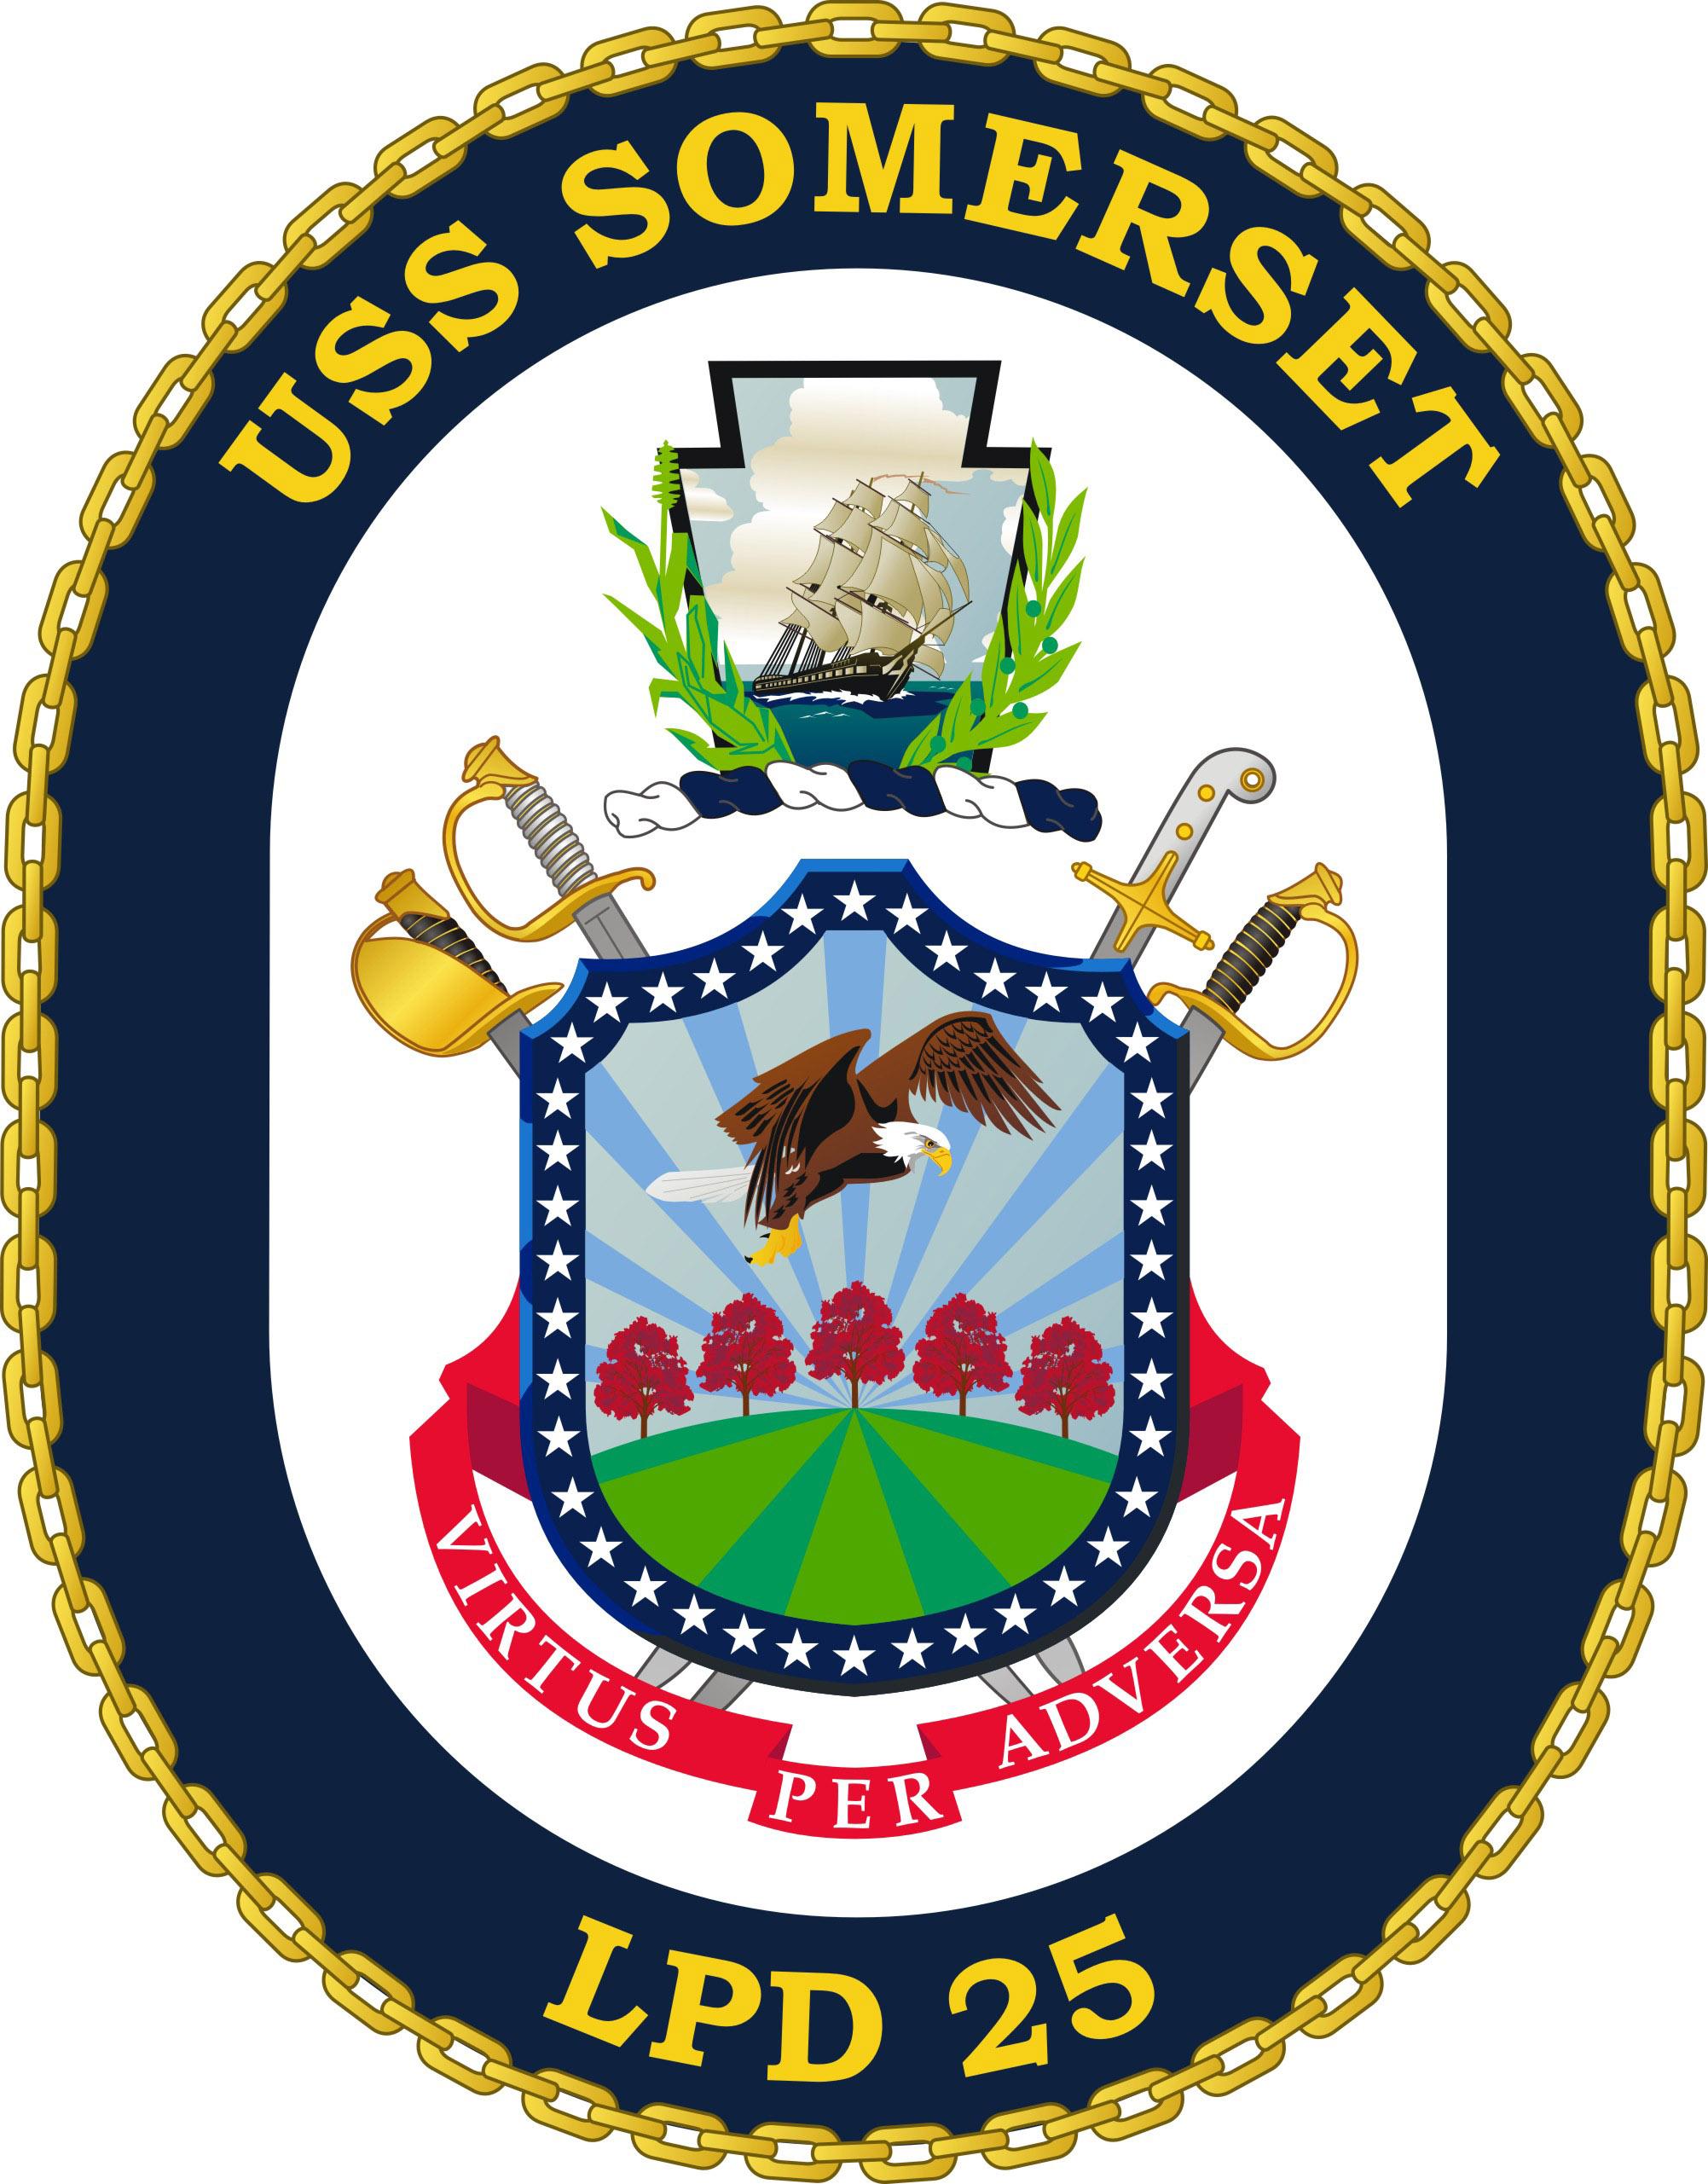 USS SOMERSET LPD-25 Crest Grafik: U.S. Navy